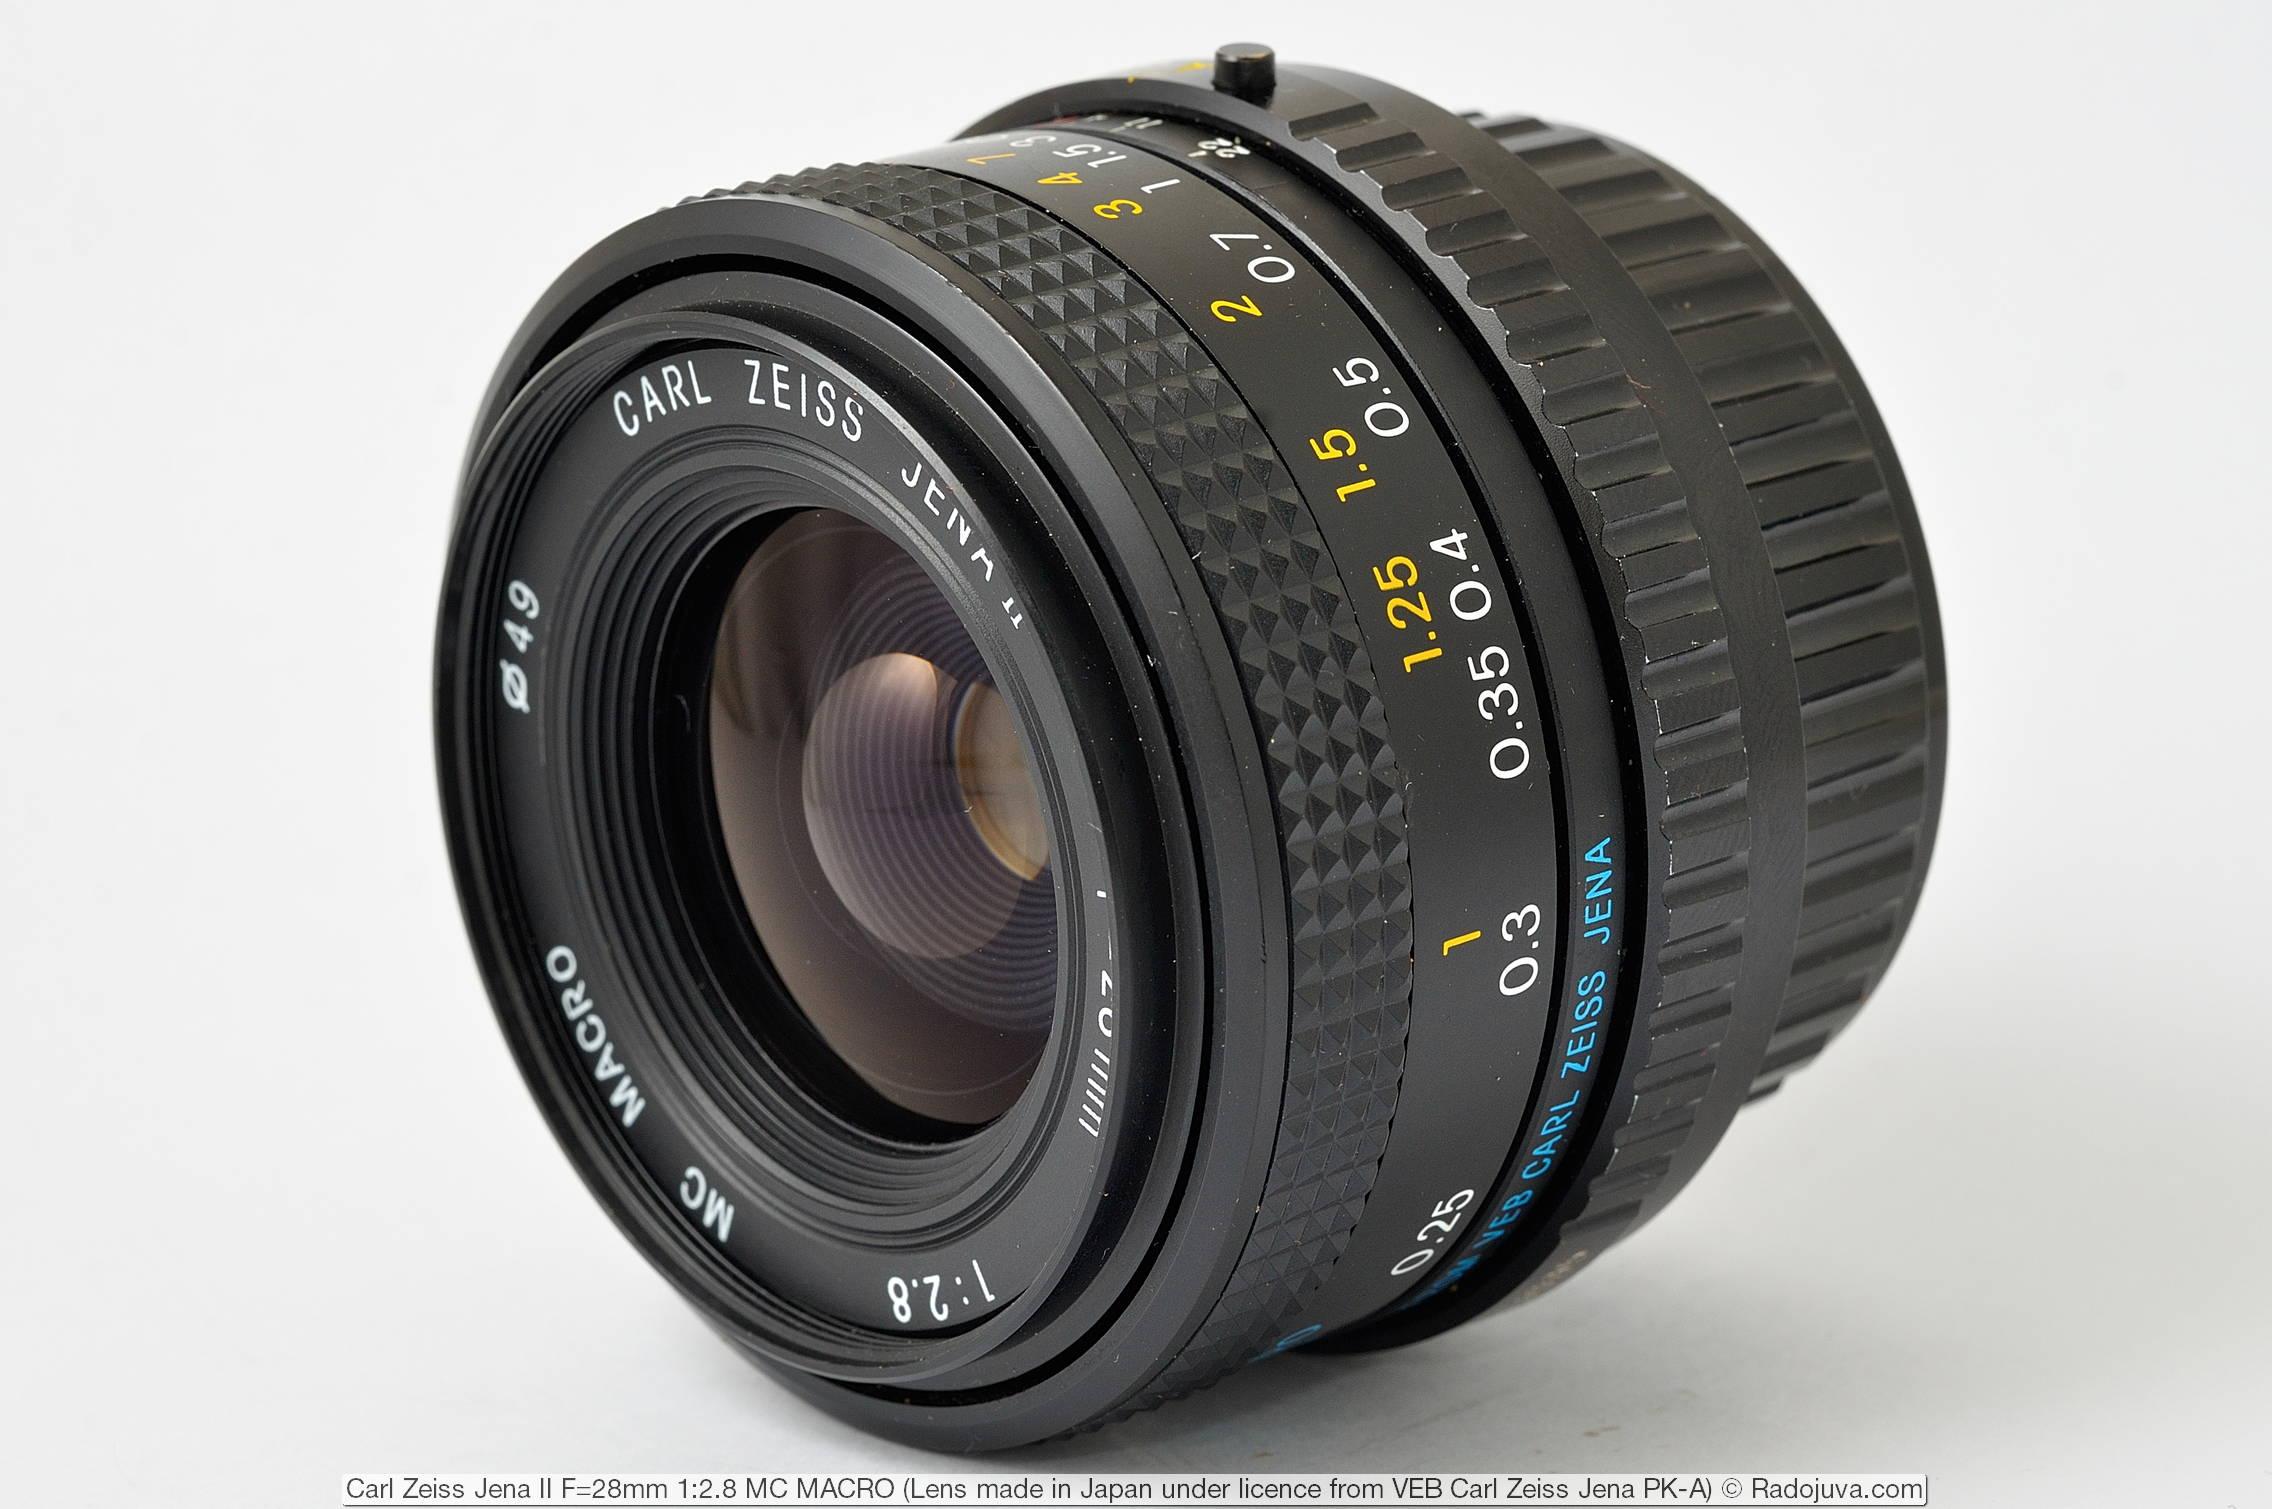 Carl Zeiss Jena II F=28mm 1:2.8 MC MACRO